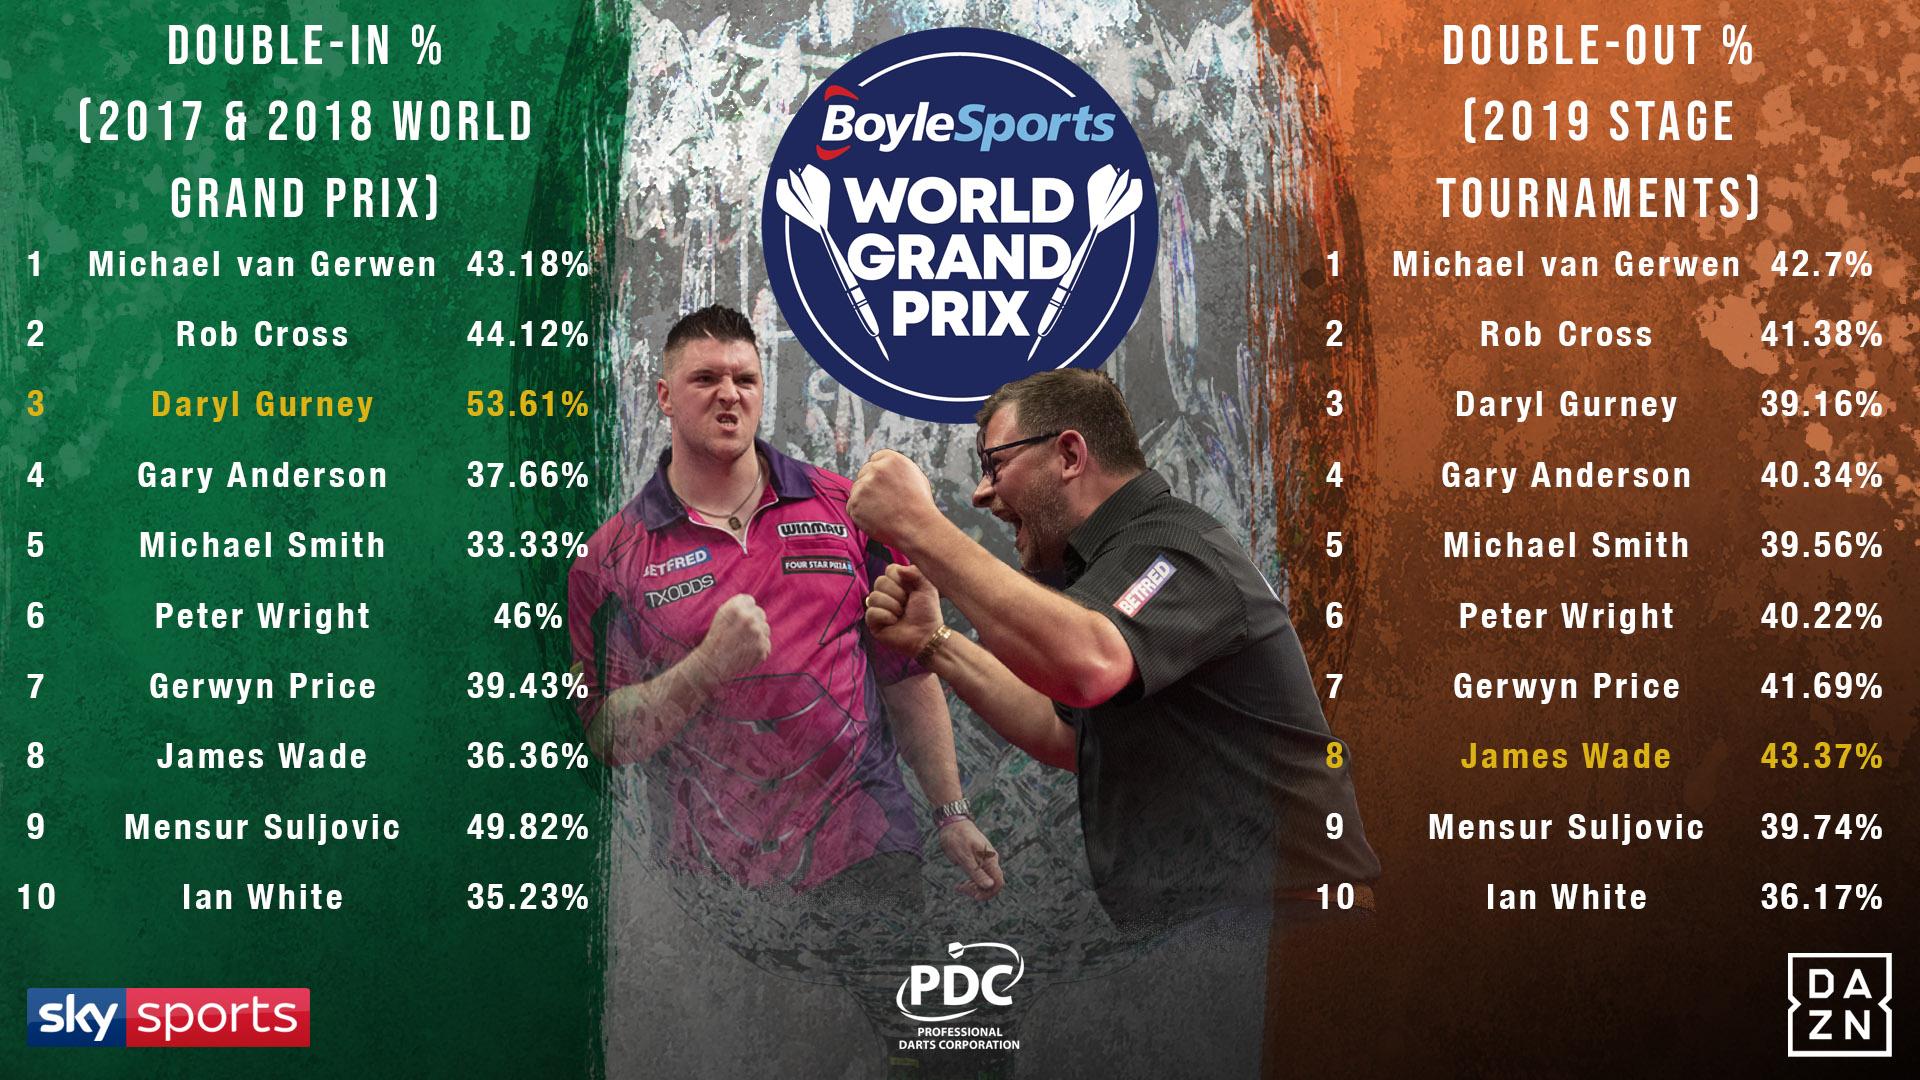 Top ten double stats (PDC)